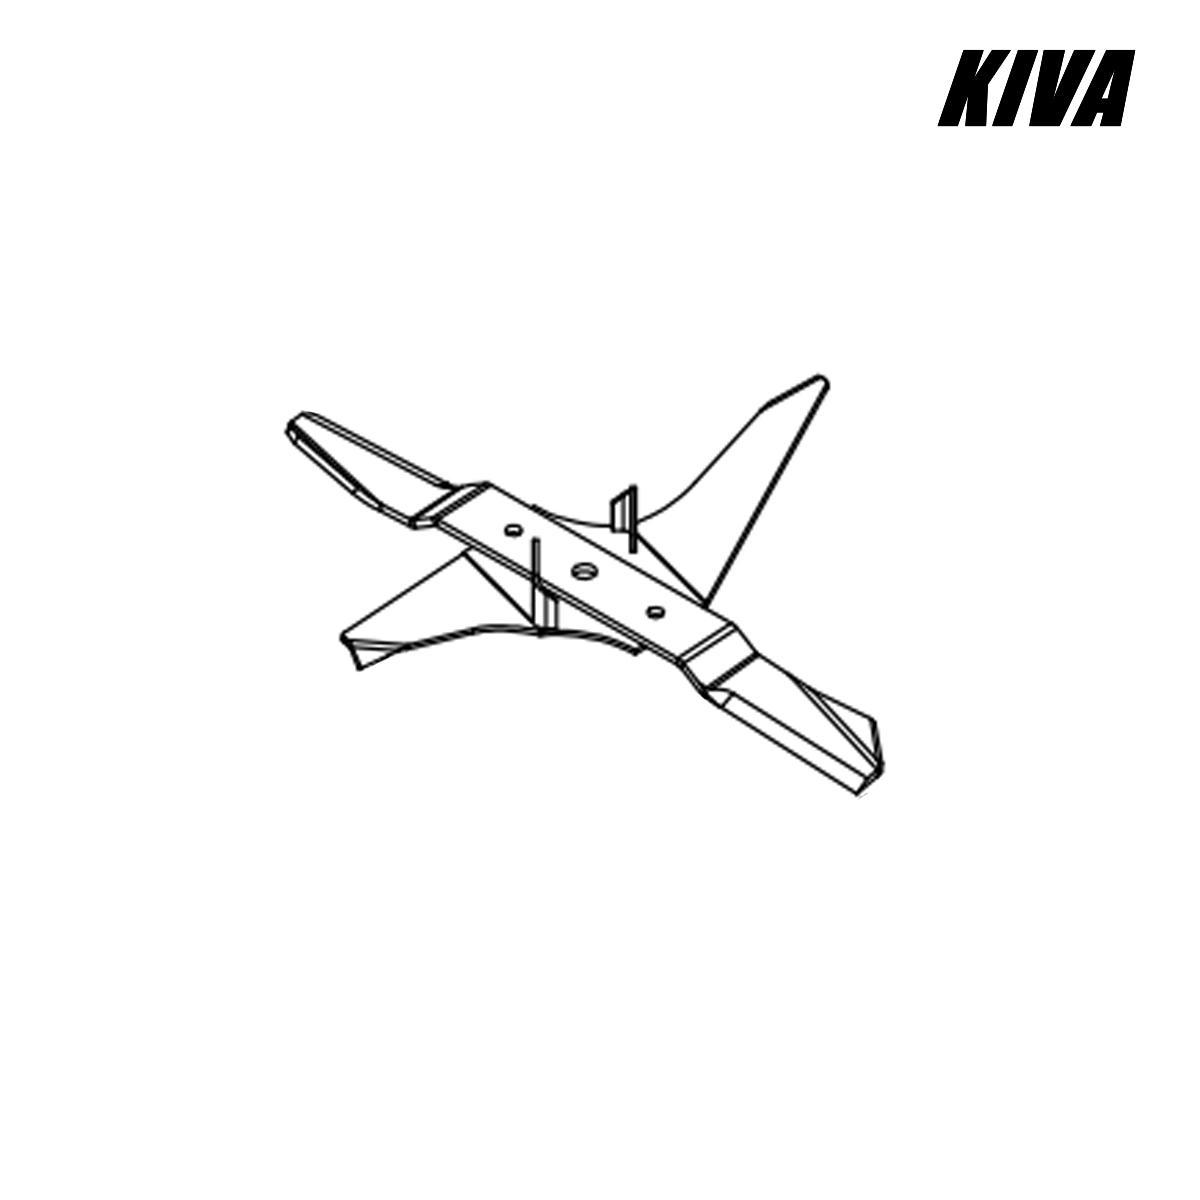 Kit cuchilla + impulsor para desbrozadora KIVA Orion R.